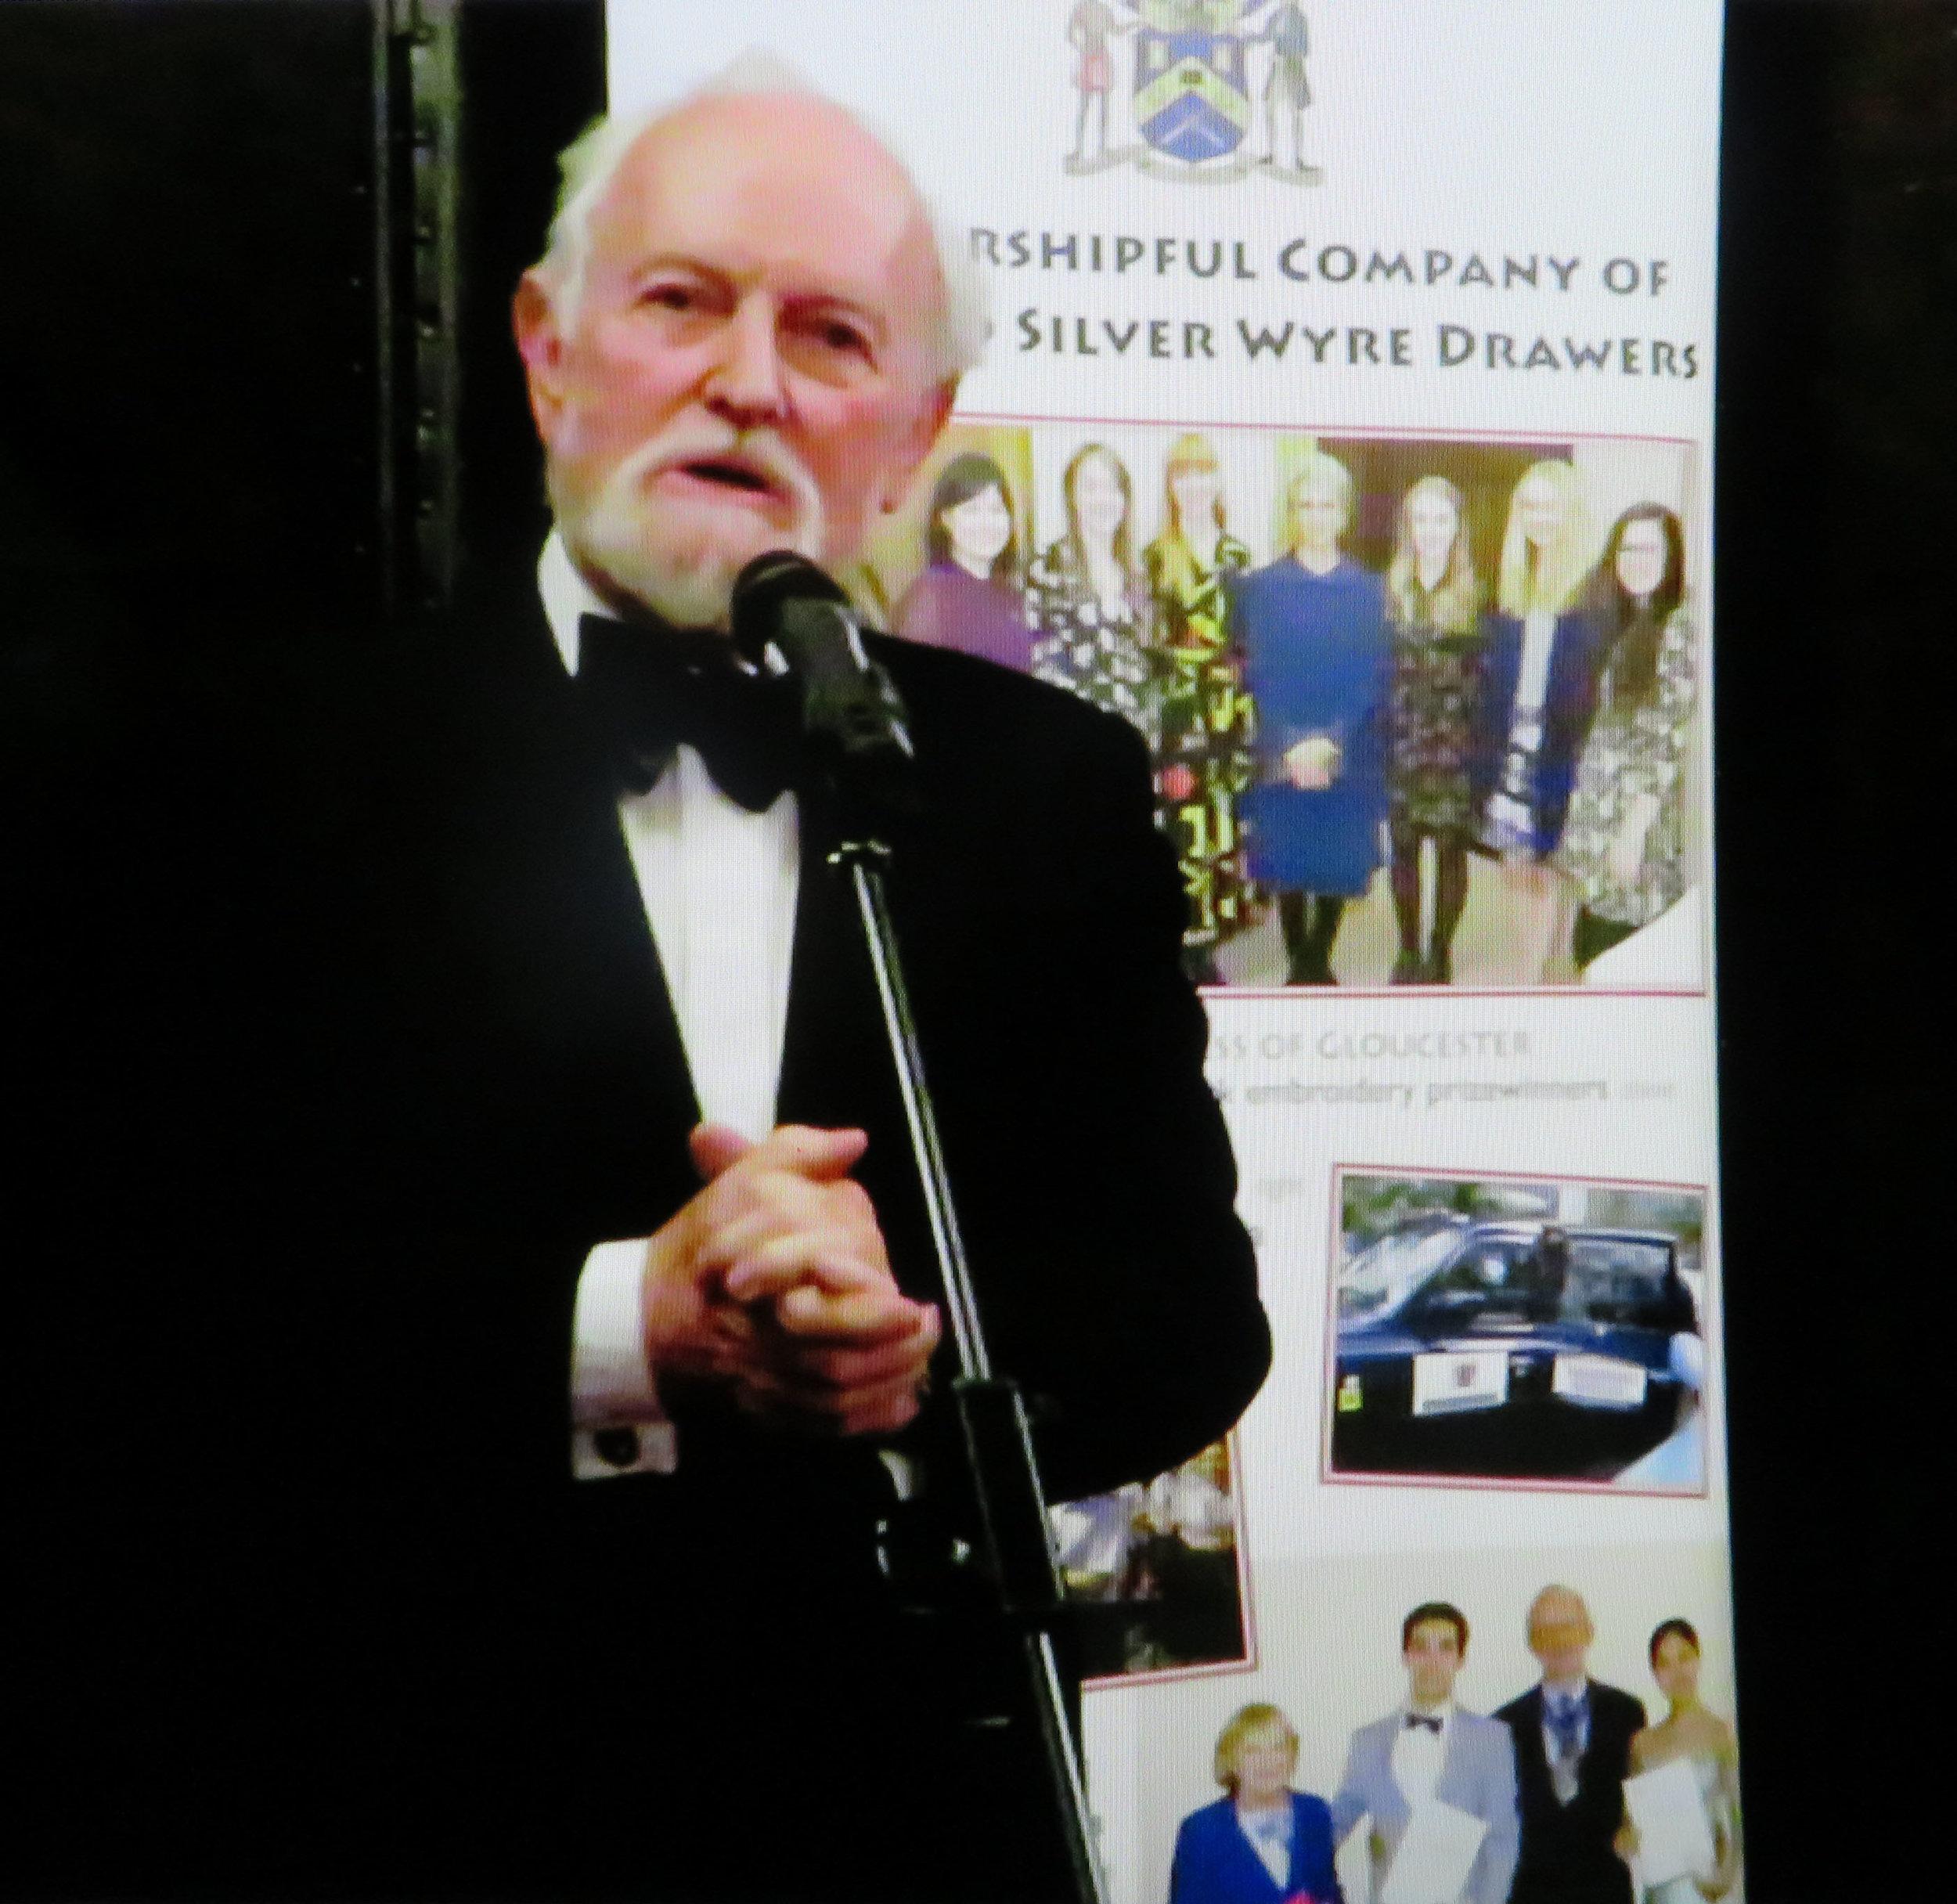 Sir Richard Stilgoe OBE DL